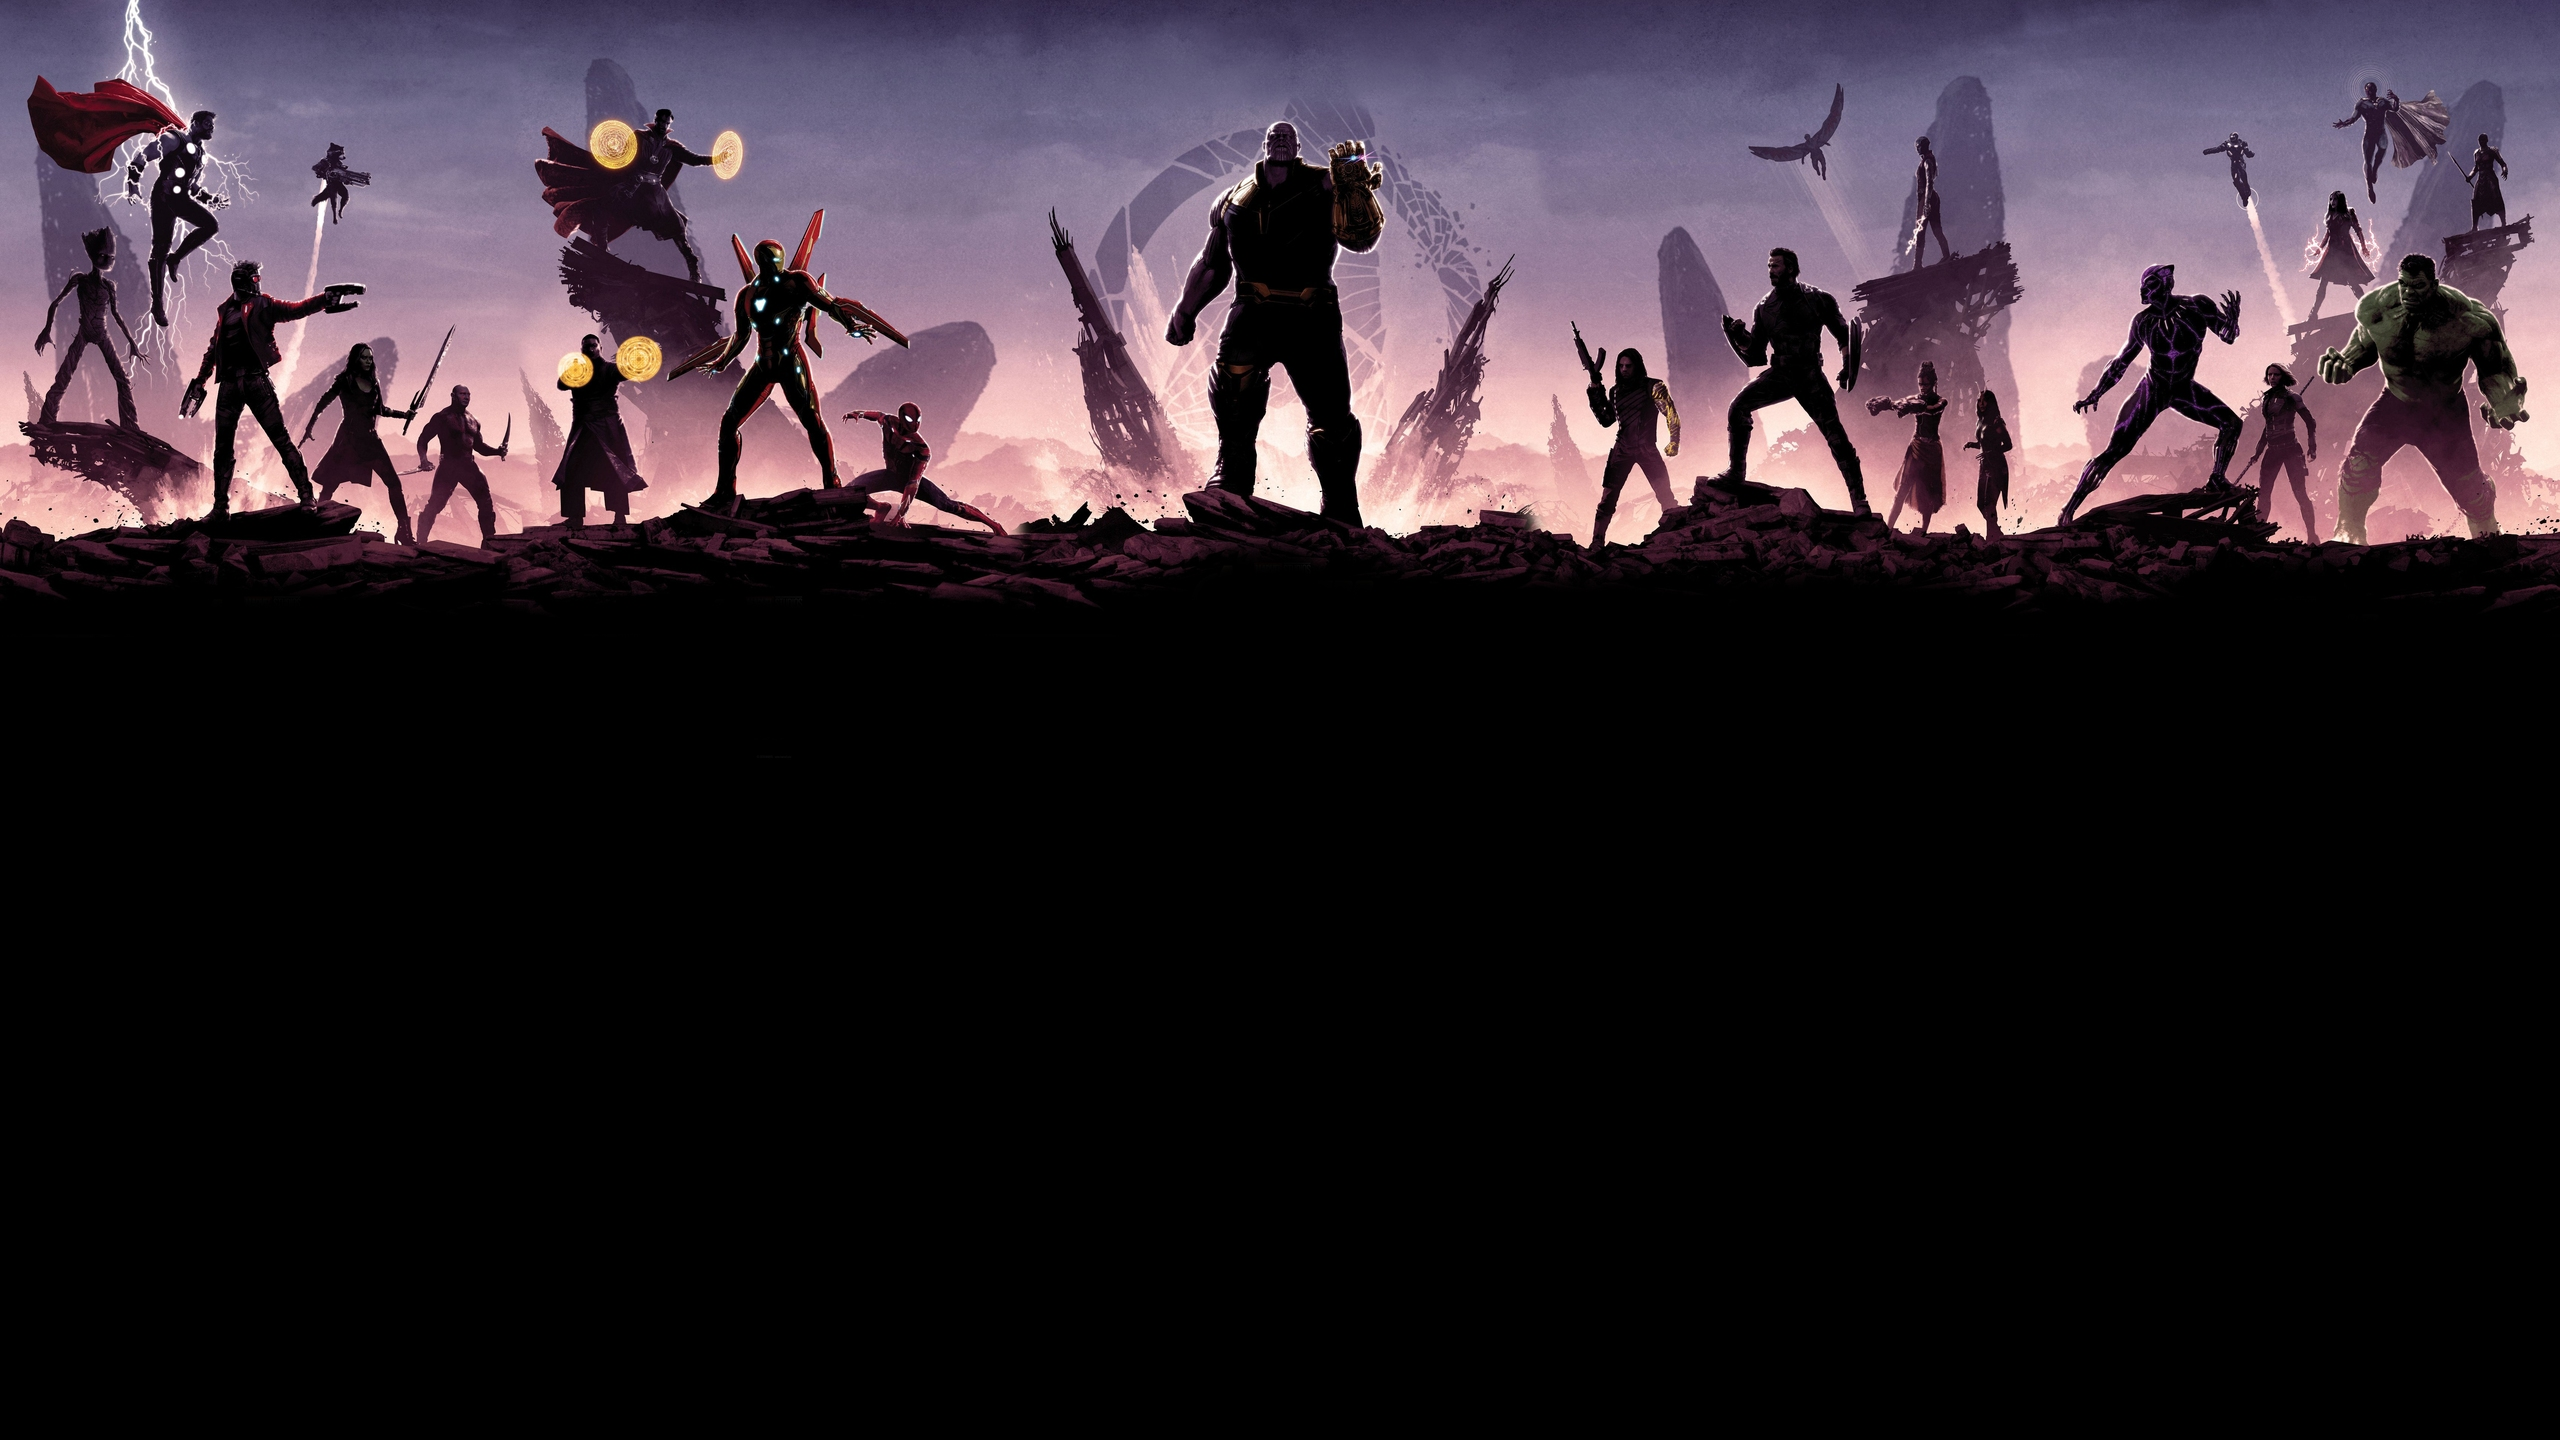 avengers-infinity-war-minimalism-8k-nh.jpg